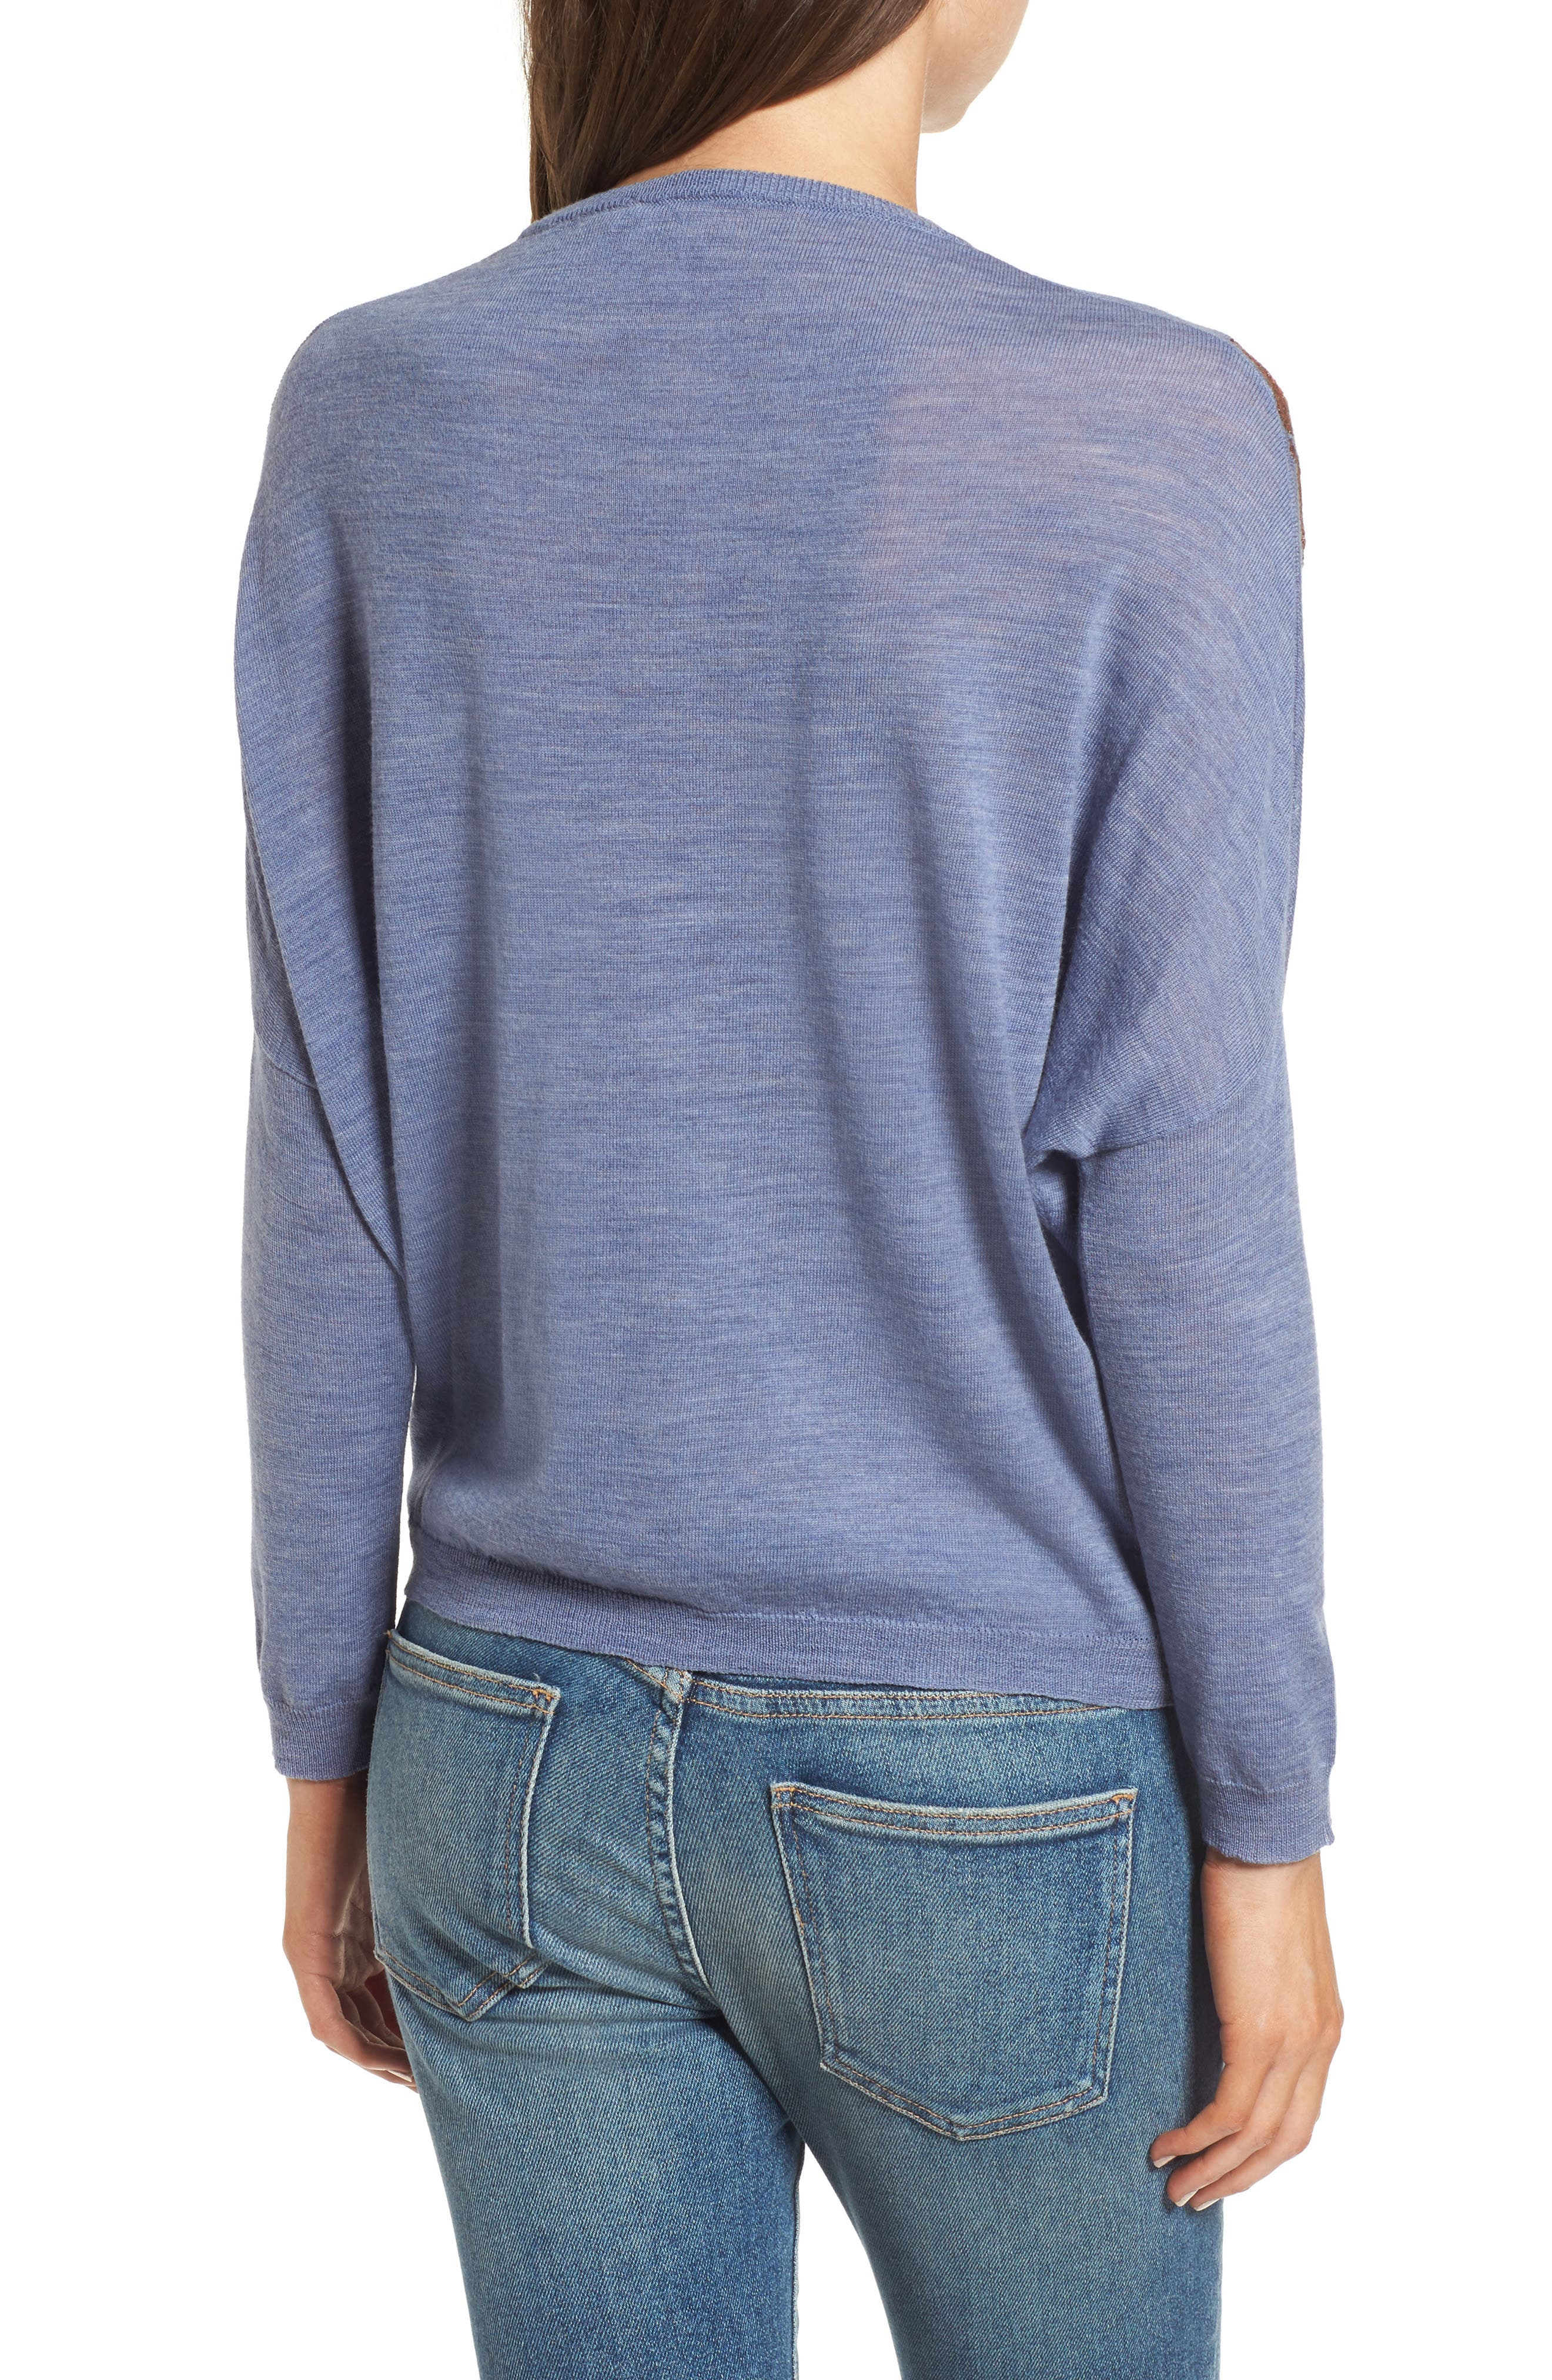 Blupalm Sweater,                             Alternate thumbnail 2, color,                             Denim